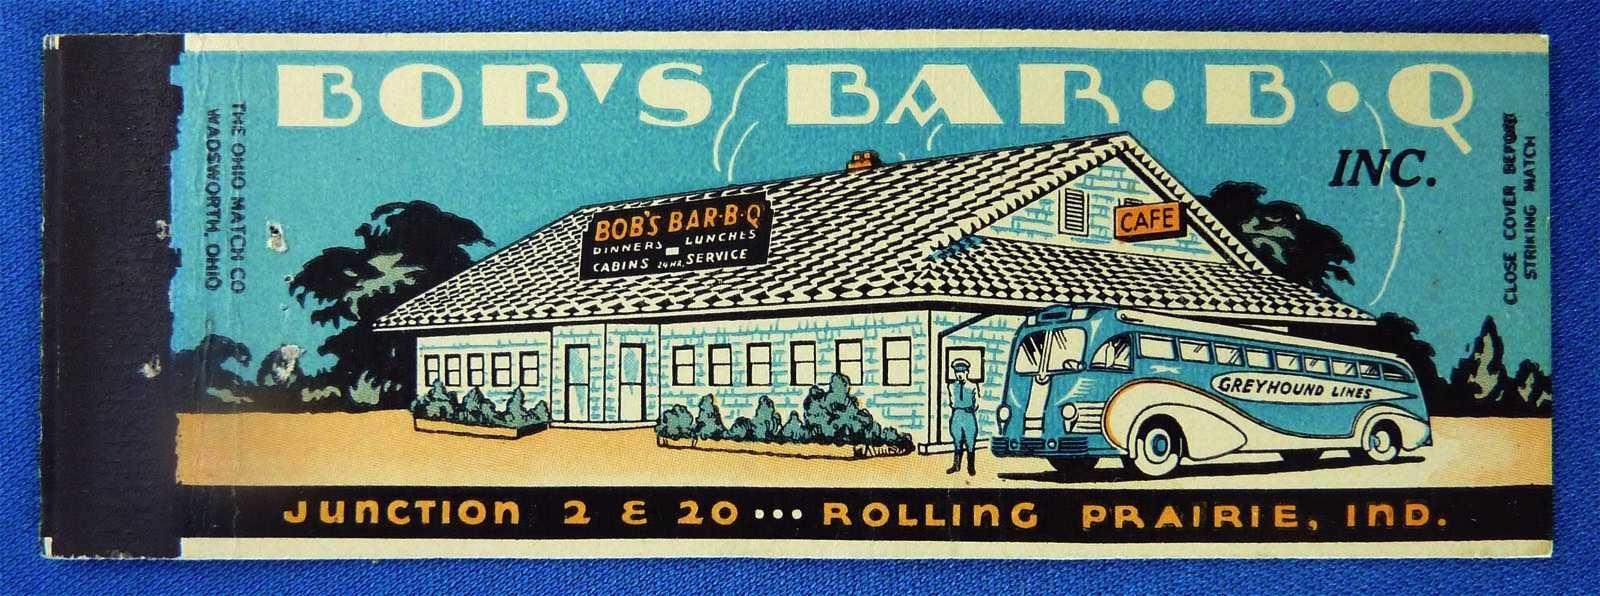 bob's barbq Matchbook, Vintage advertisements, Light